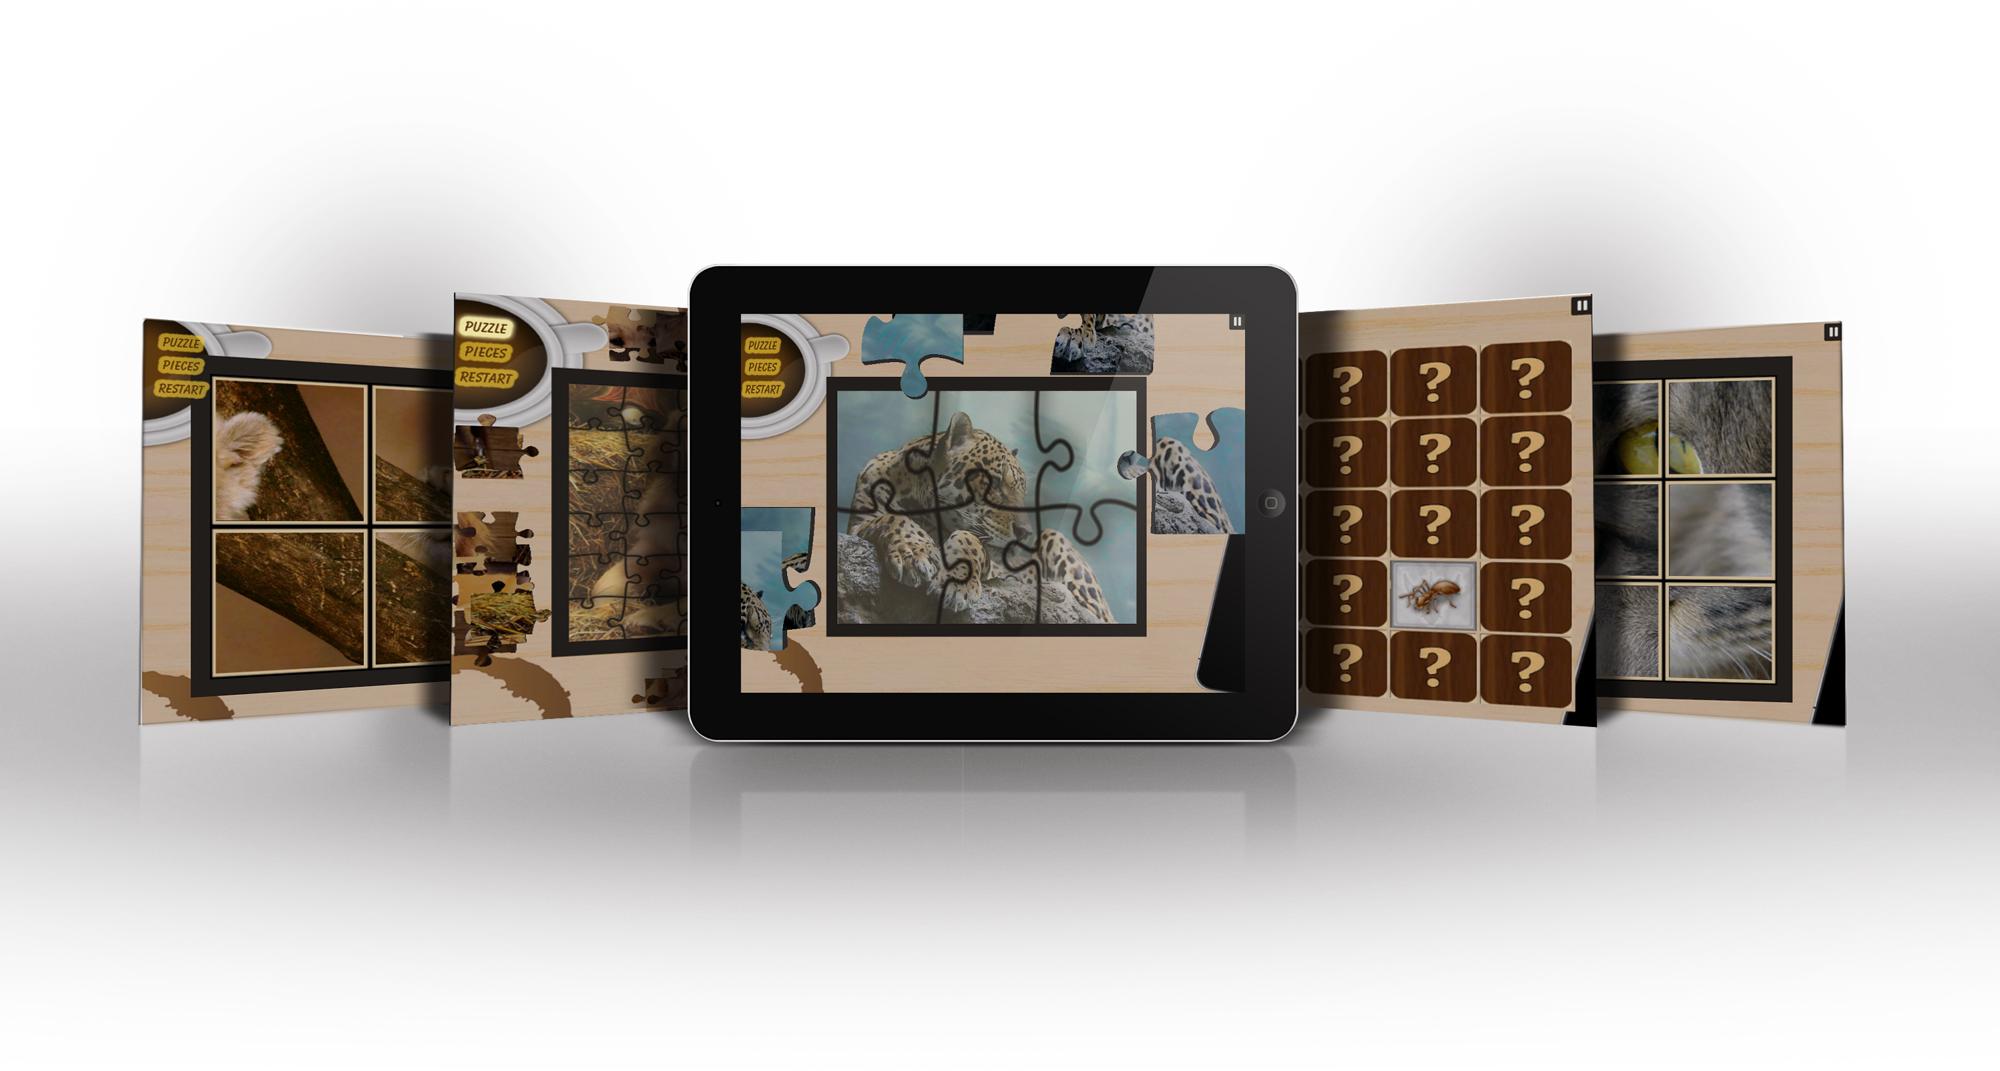 Puzzle Pro 3x1 - iPad